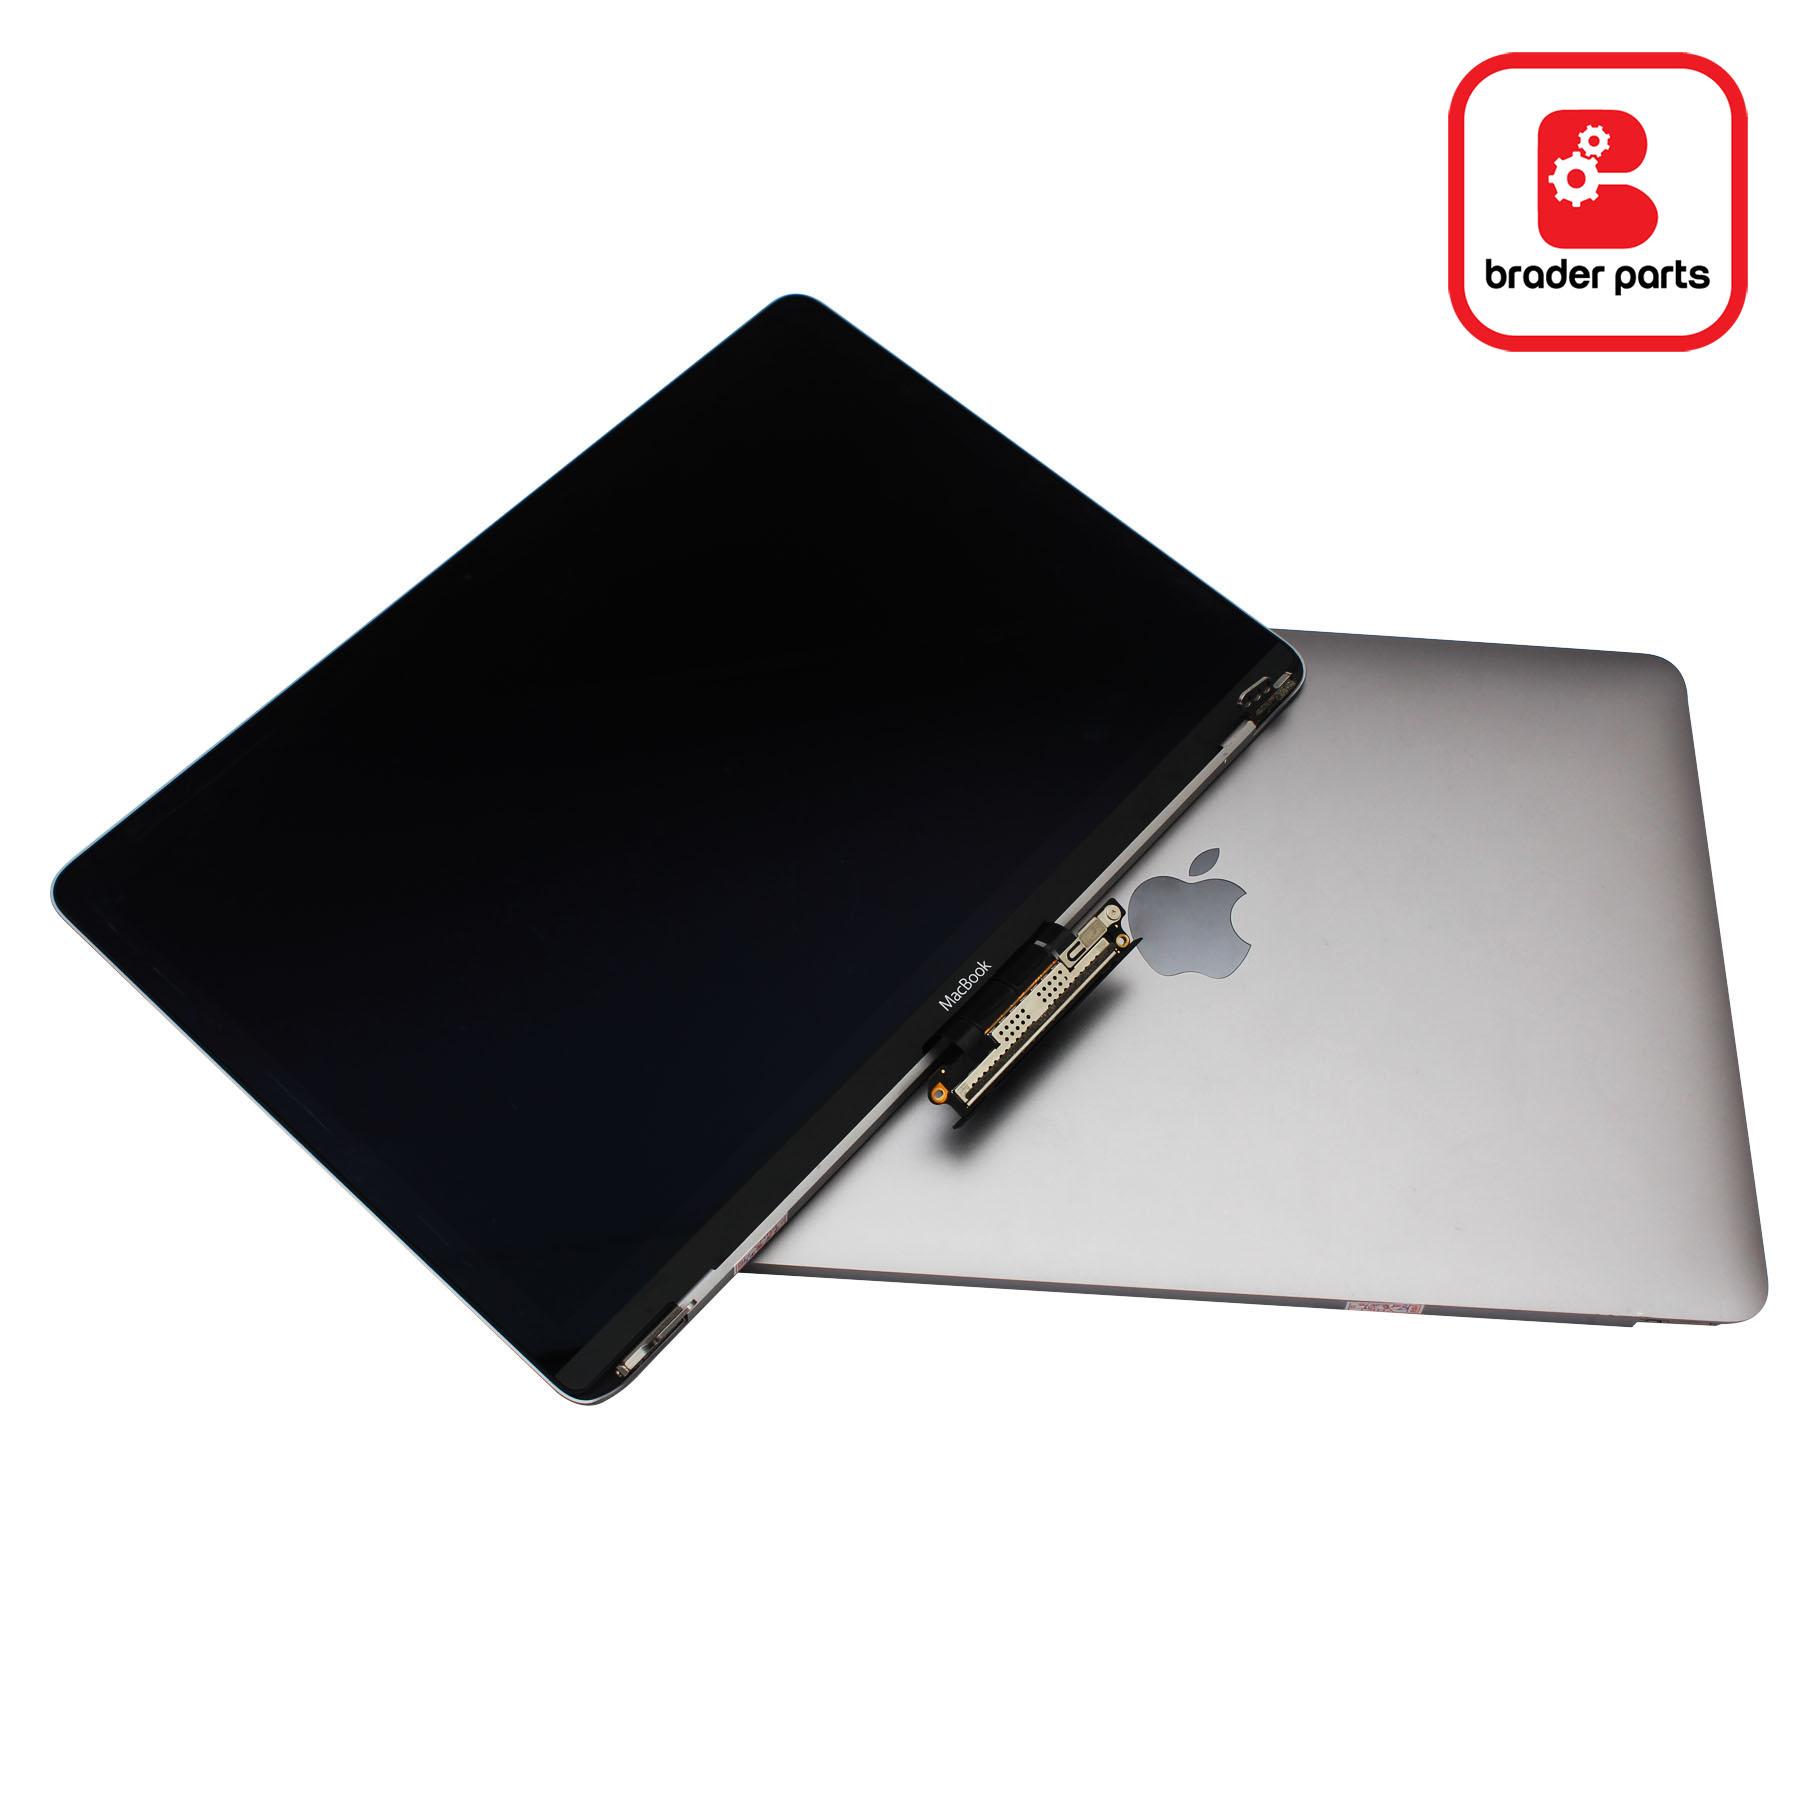 Lcd Macbook Retina 12 a1534 fullset